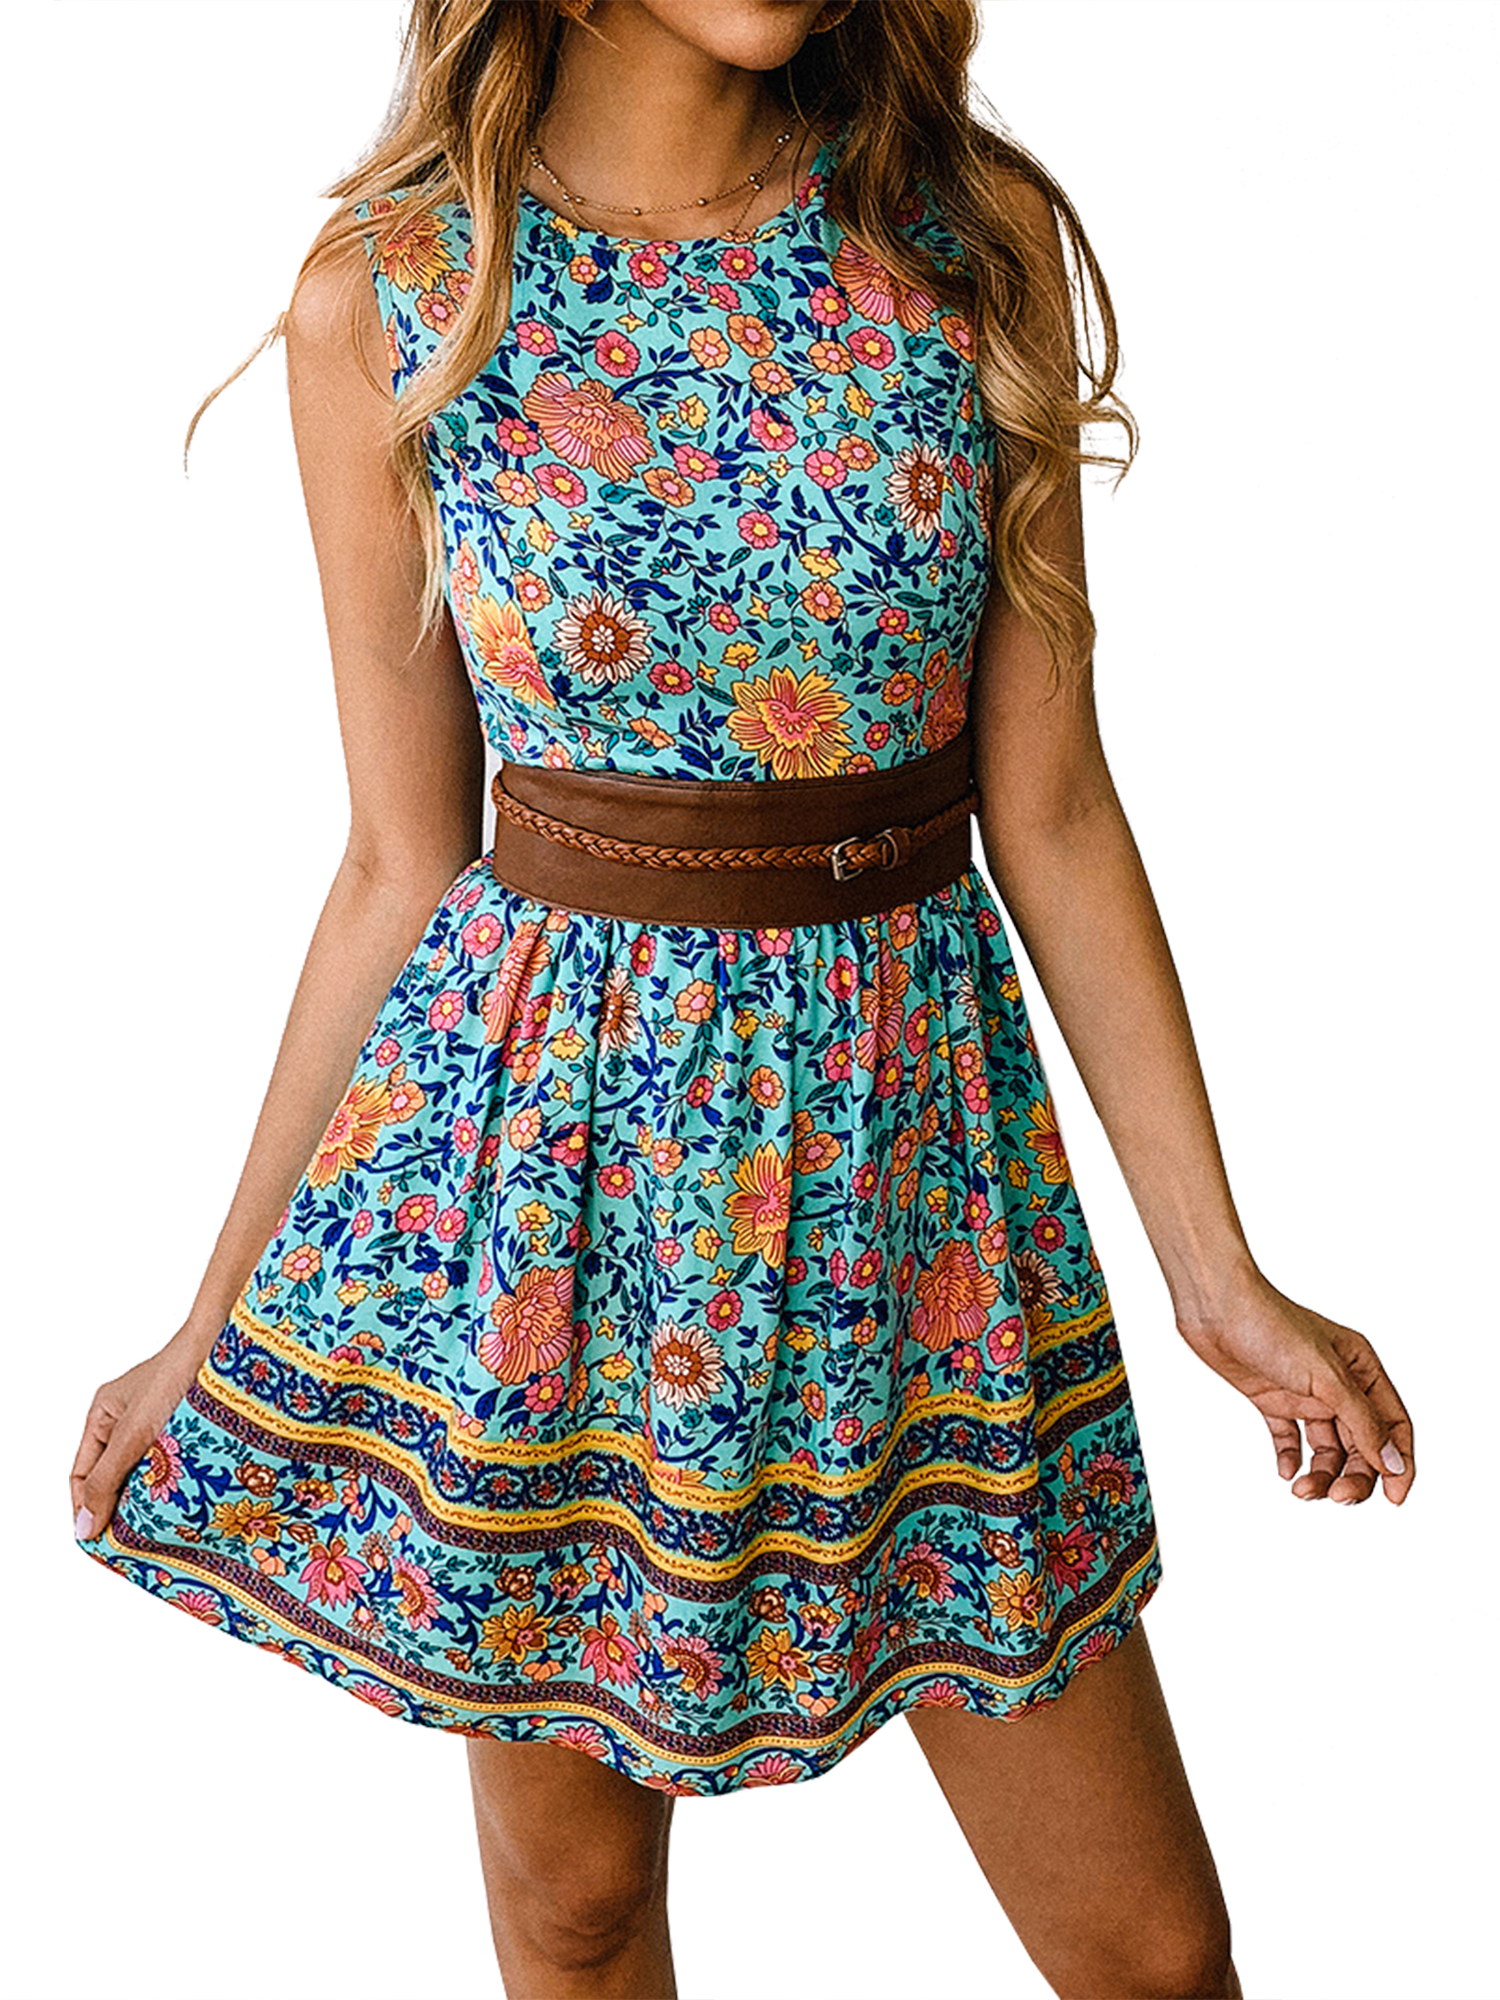 Women/'s Summer Swing Skater Dress Short Sleeve Evening Party Mini Dress Sundress